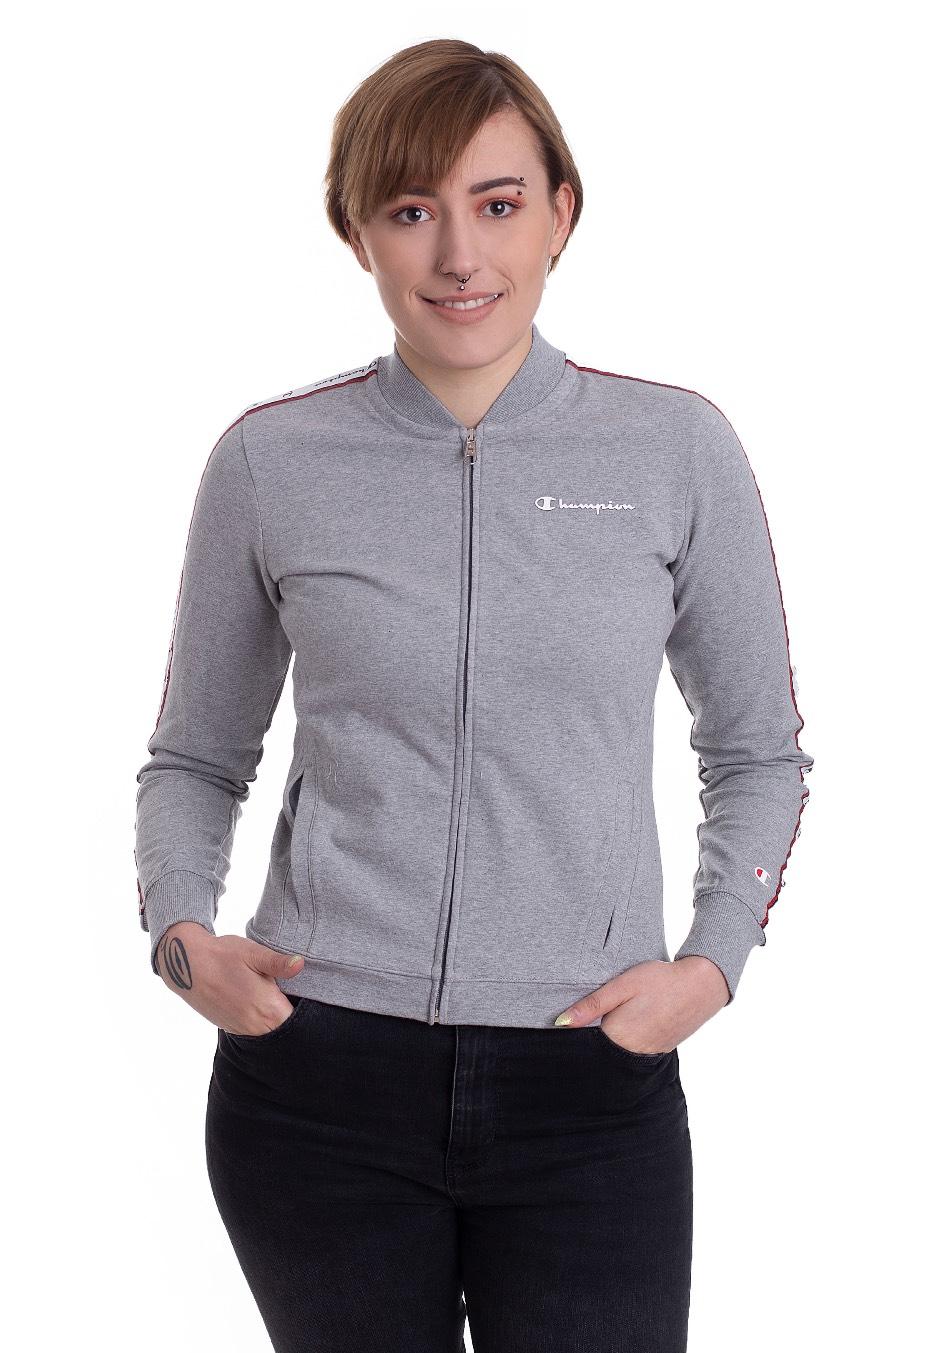 Jacken - Champion Full Zip OXGM Jacken  - Onlineshop IMPERICON